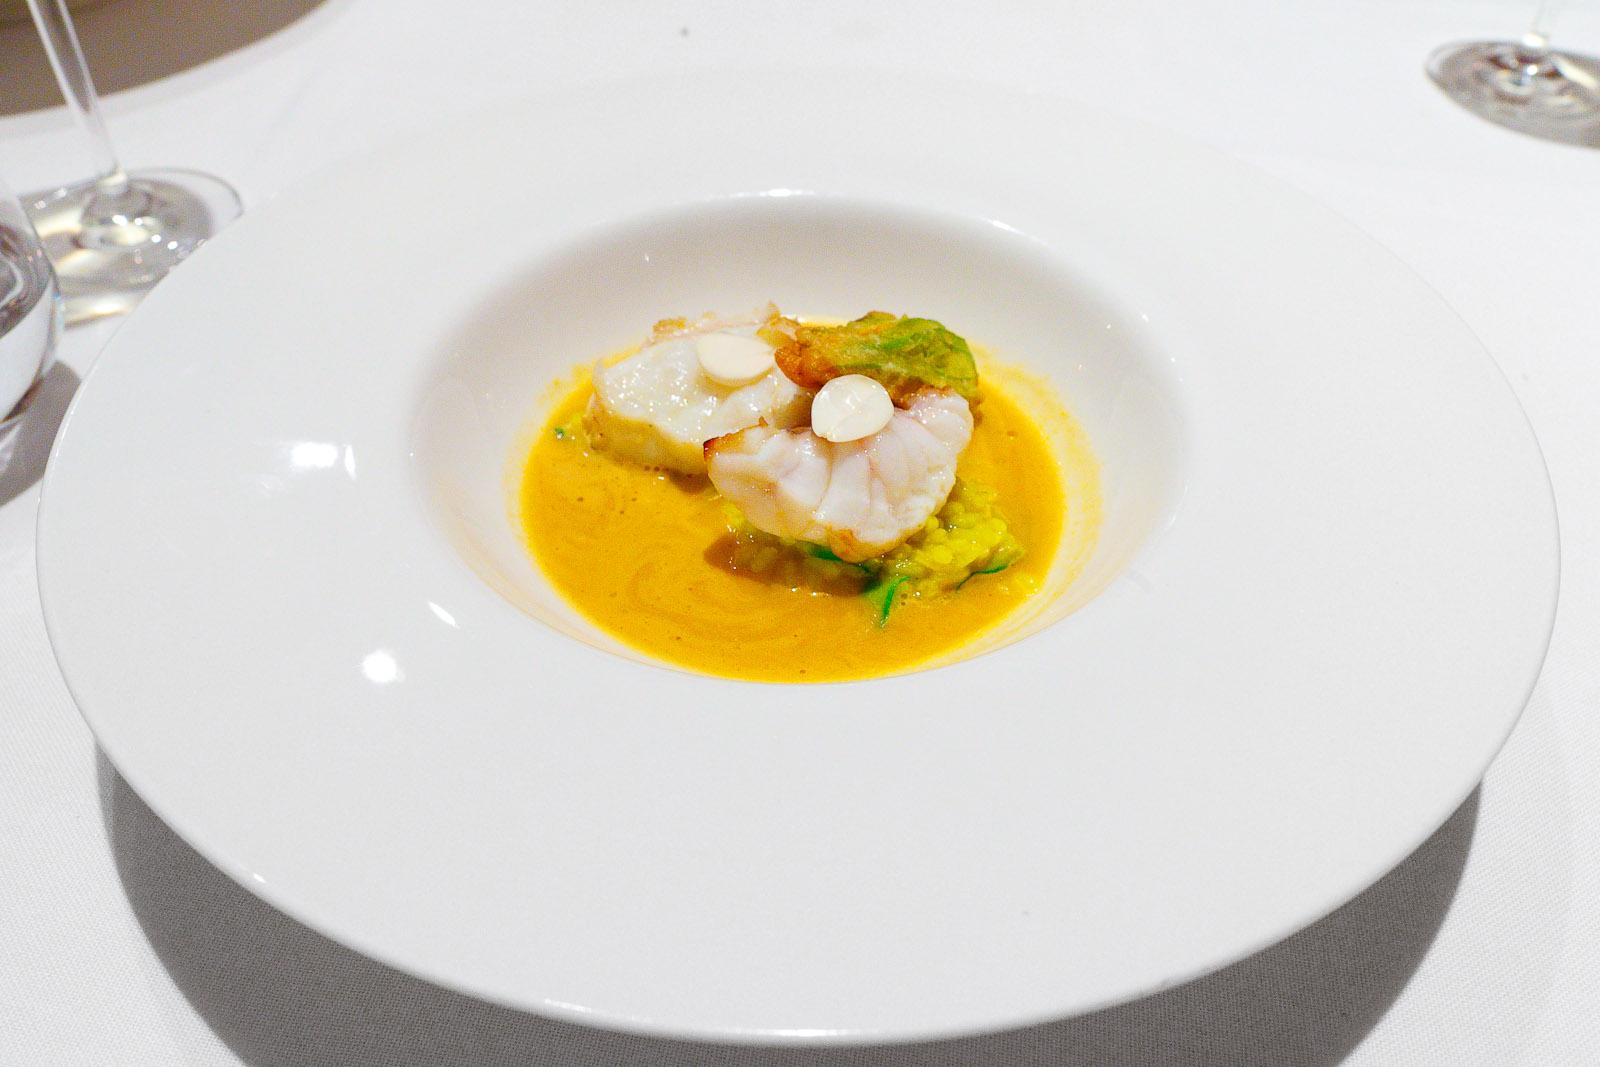 Monkfish with saffron rice and zucchini flower